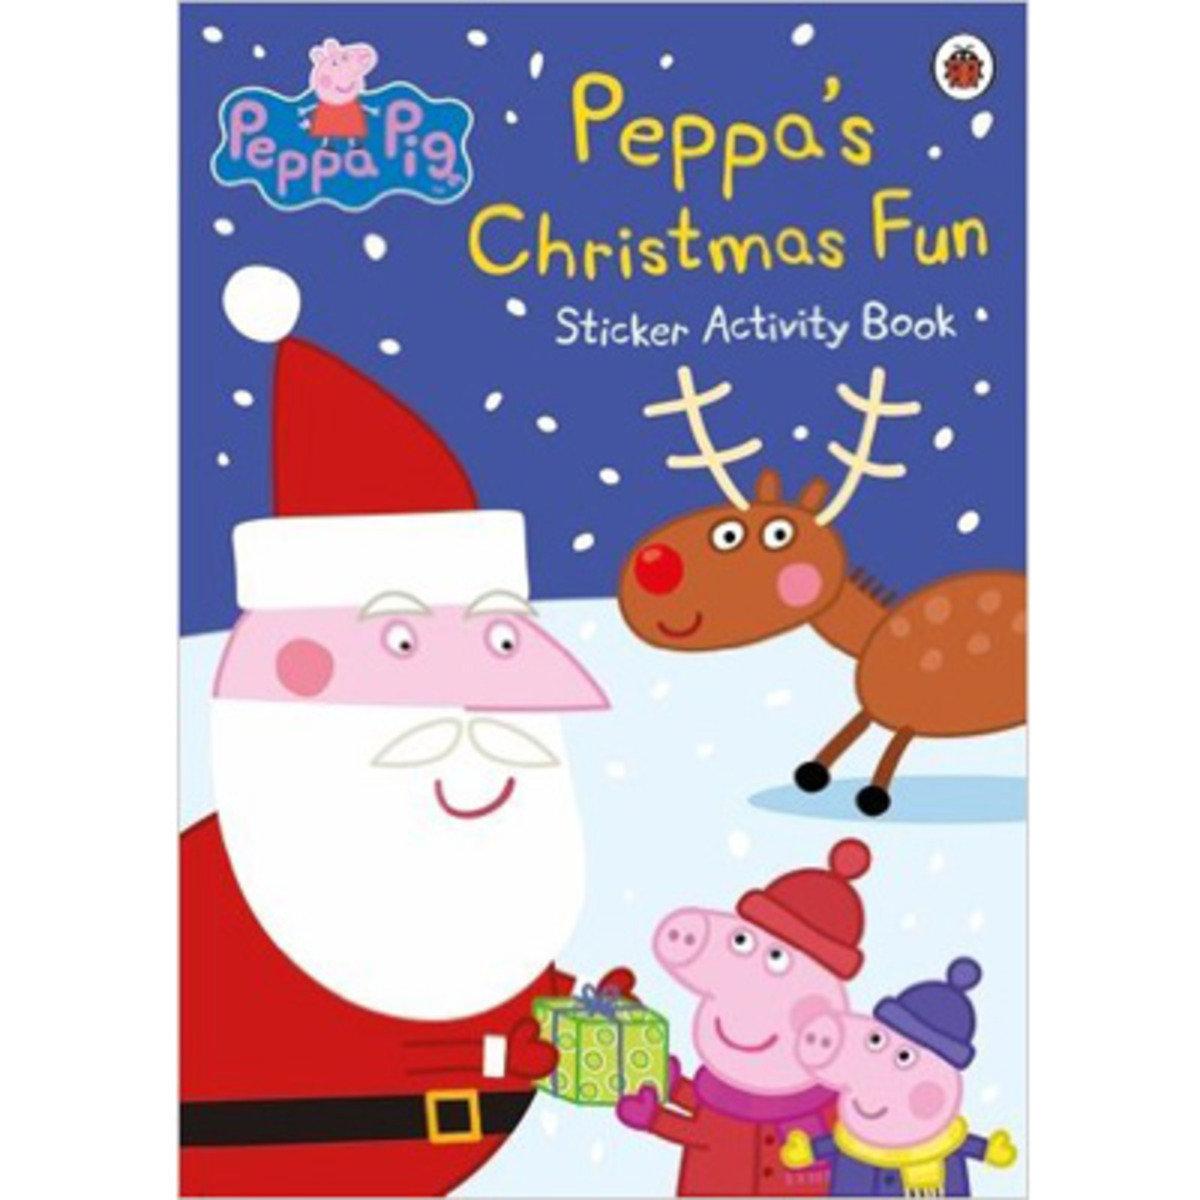 PEPPA'S CHRISTMAS FUN STICKER ACTIVITY BOOK 9780241200414